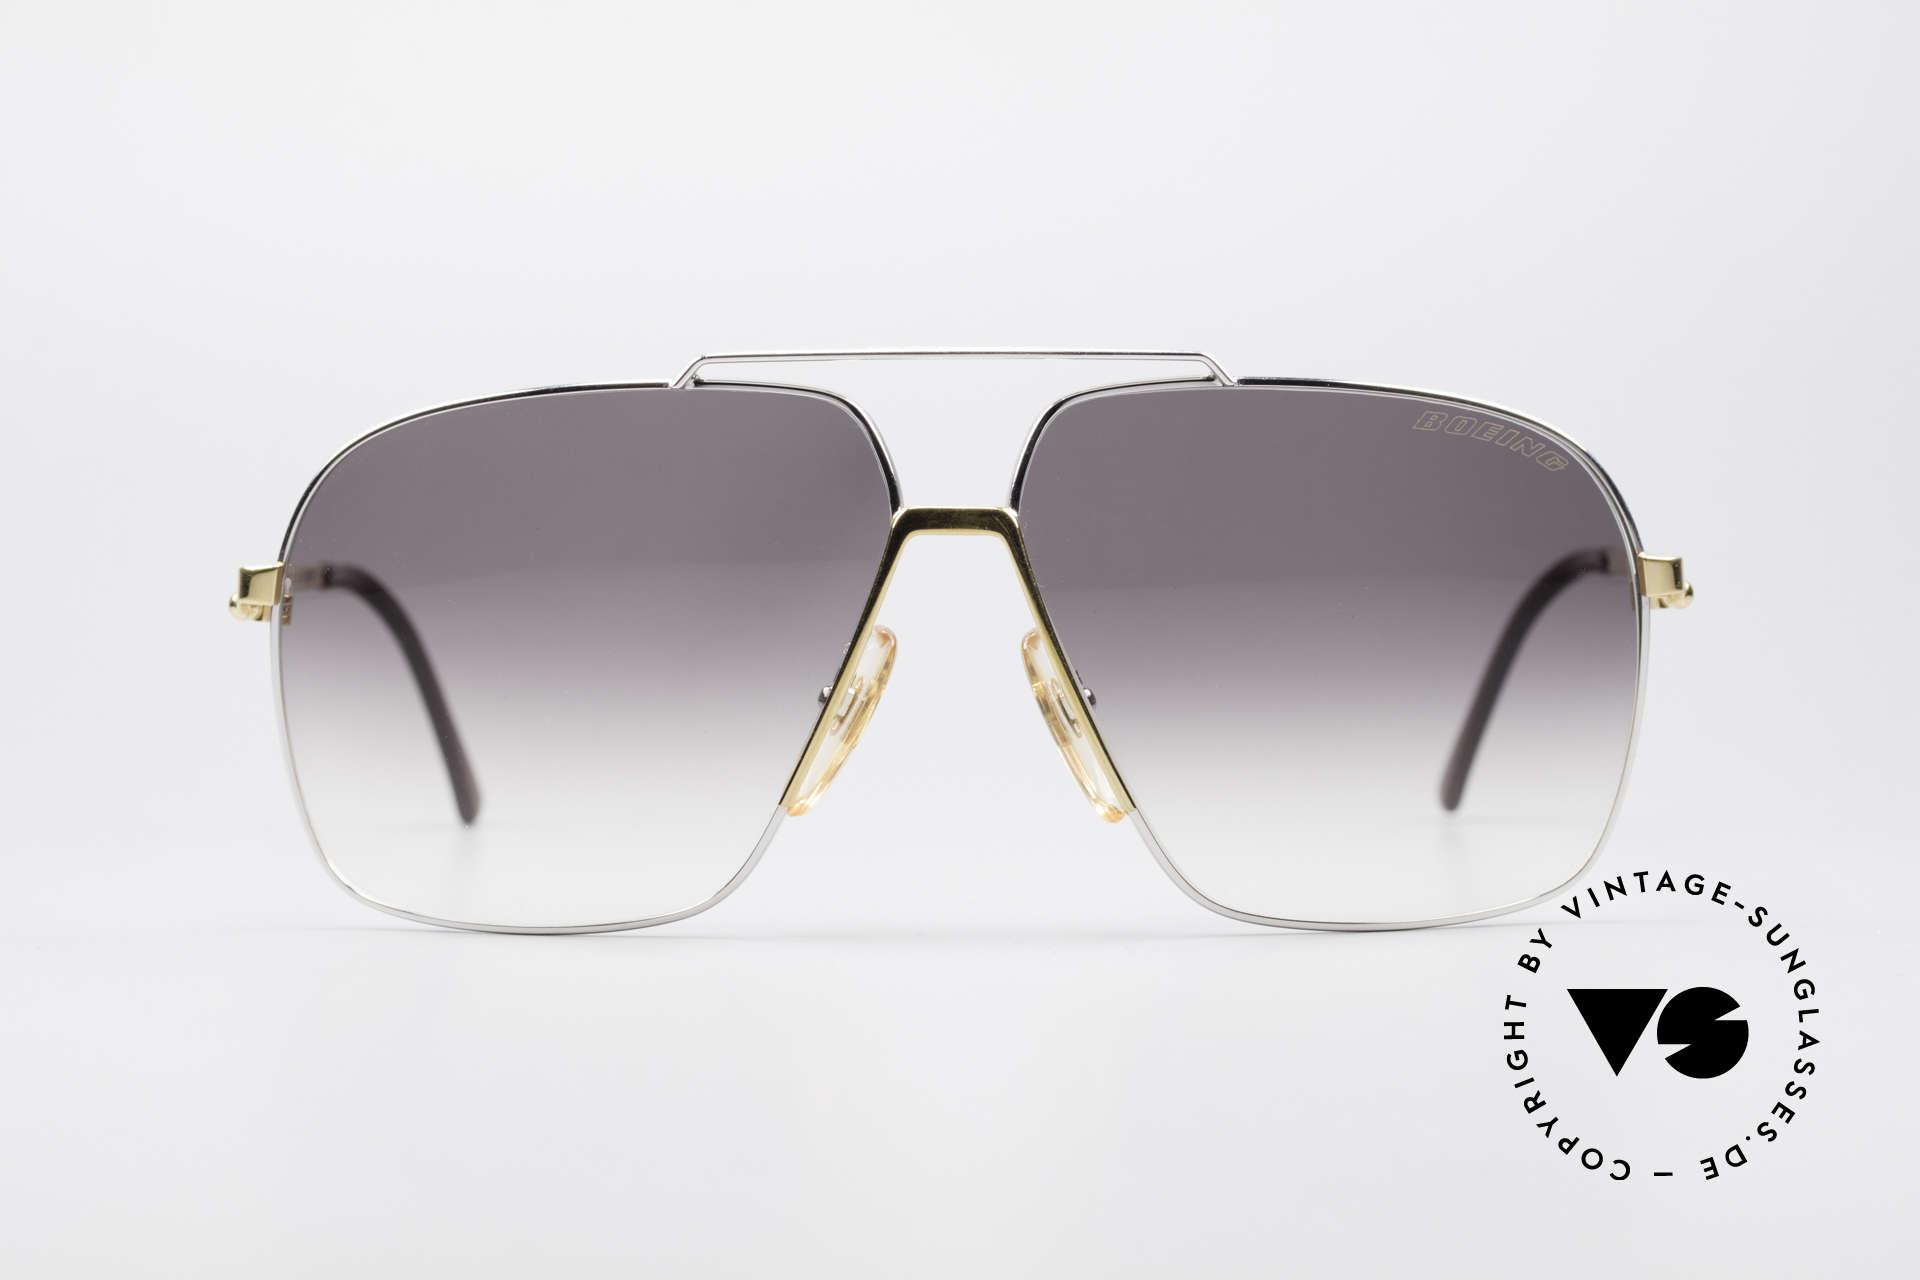 8789f30d74 Sunglasses Boeing 5704 Original 80 s Pilots Shades